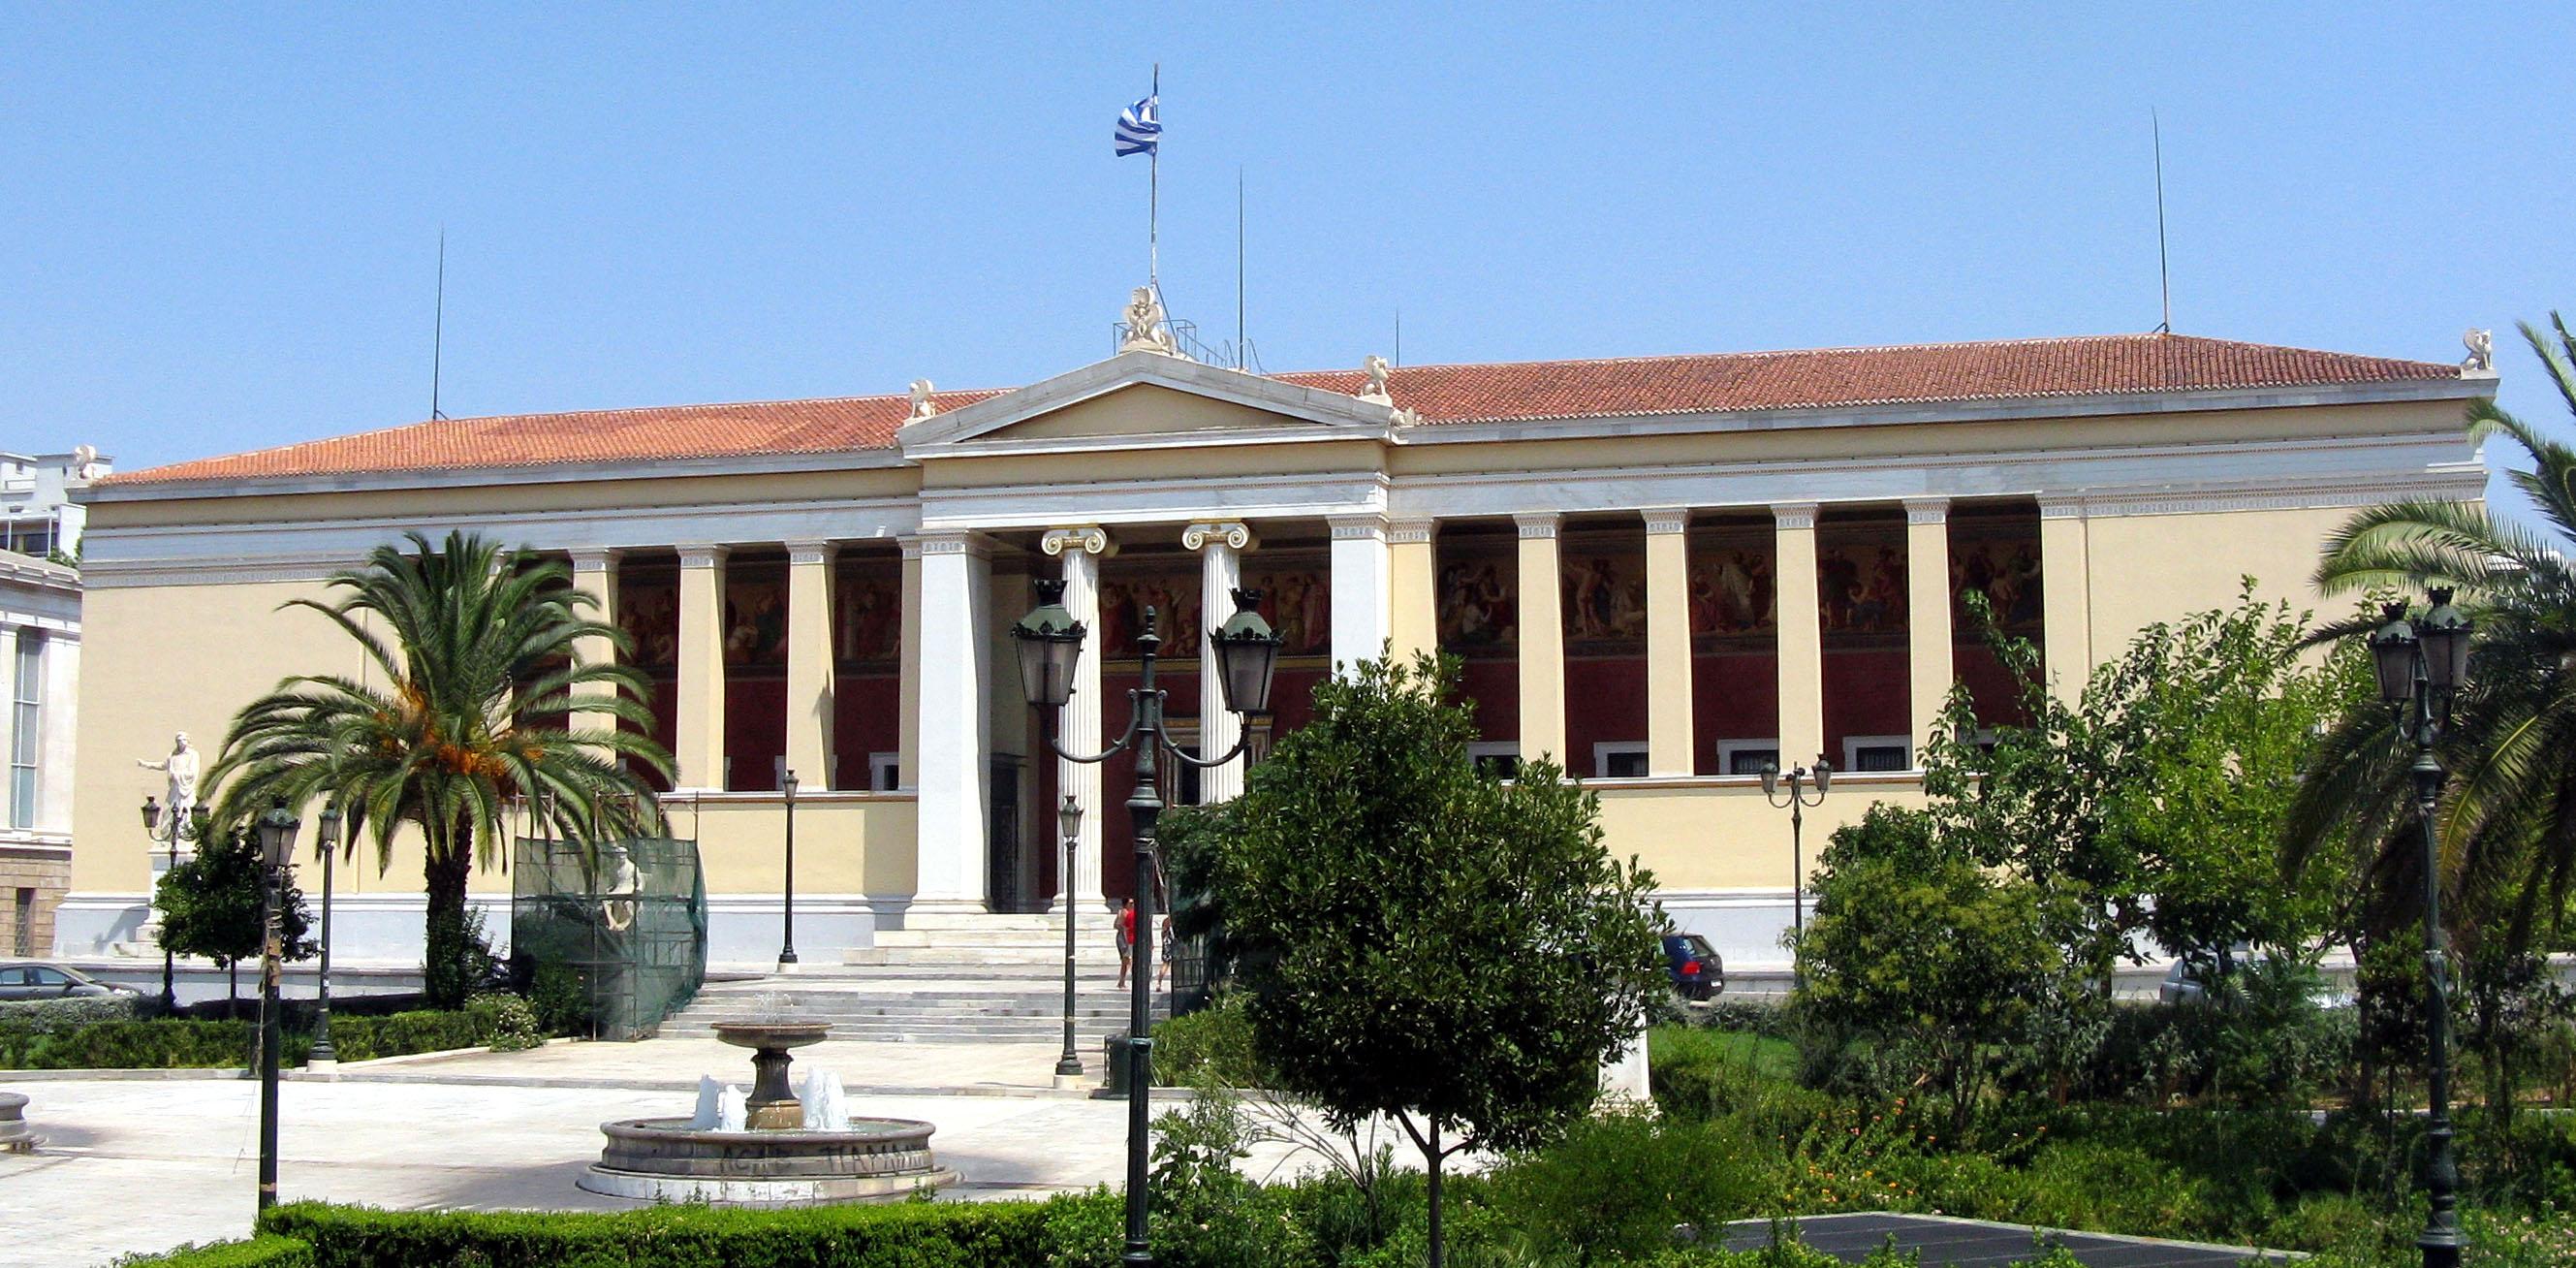 https://upload.wikimedia.org/wikipedia/commons/2/2e/University_of_Athens.jpg